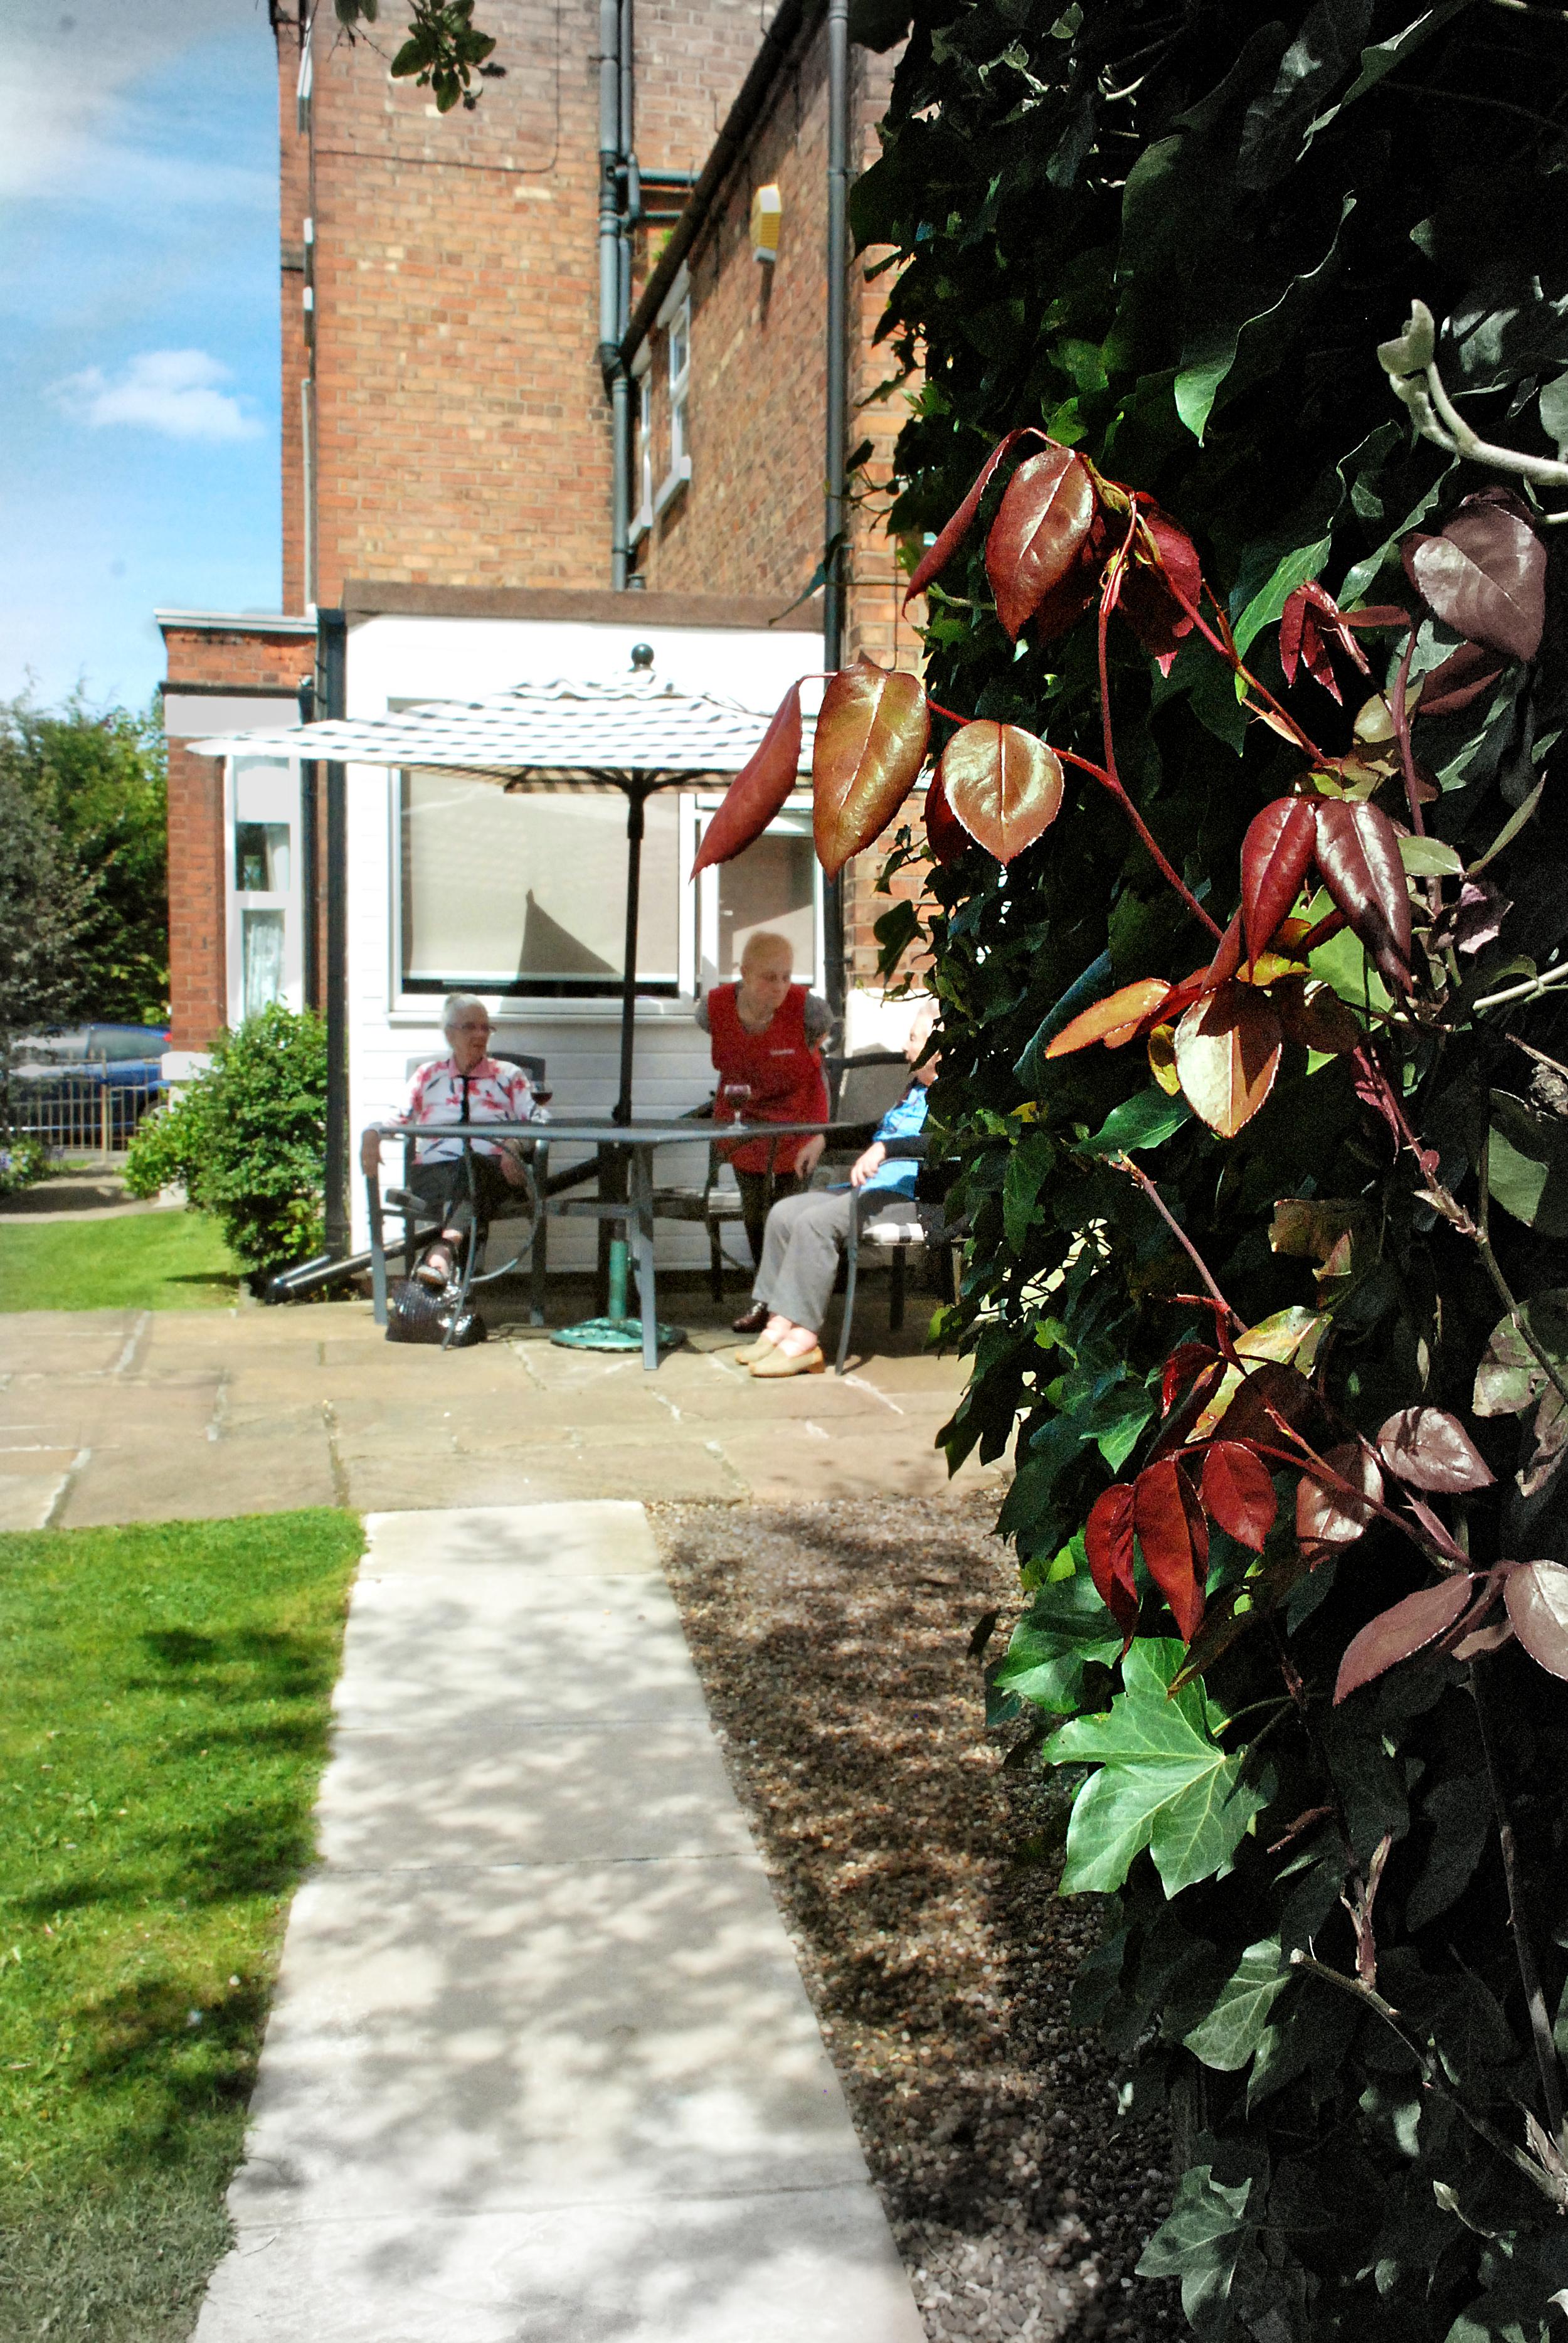 sittingoutdoors-behind bush.jpg